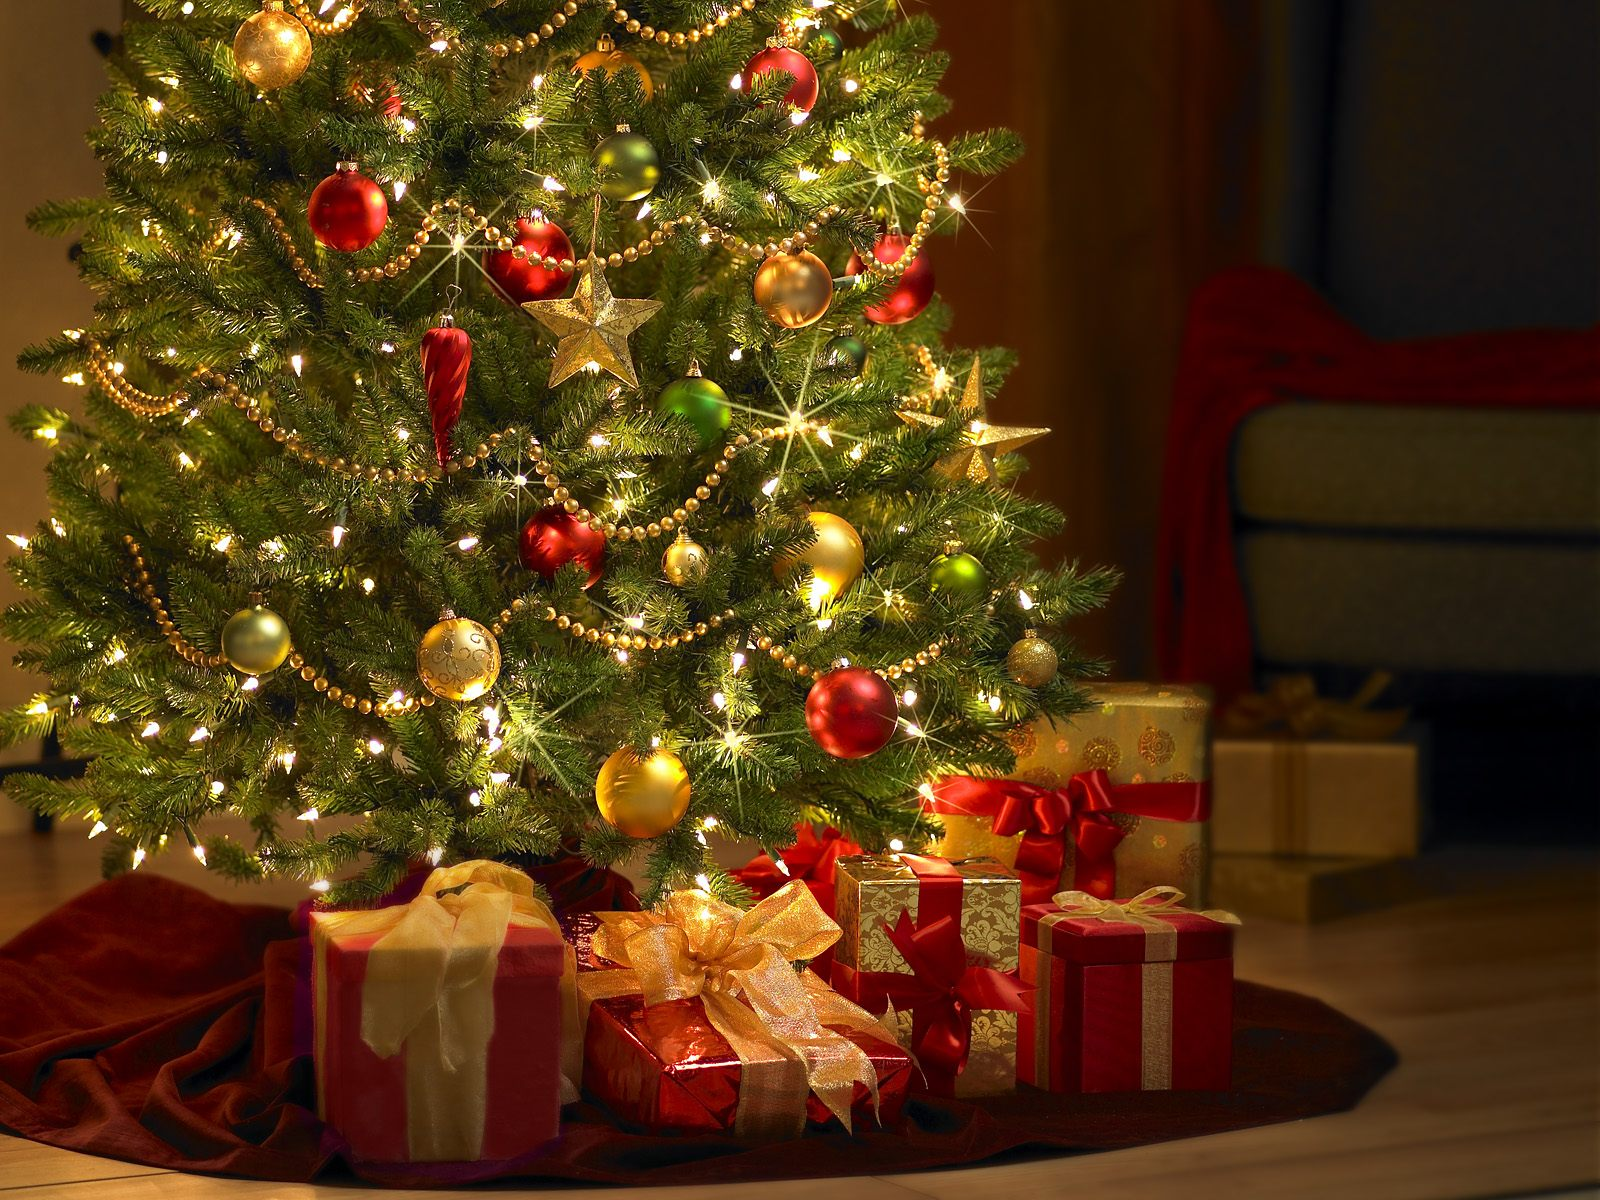 ChristmasTreeWithPresents.jpg